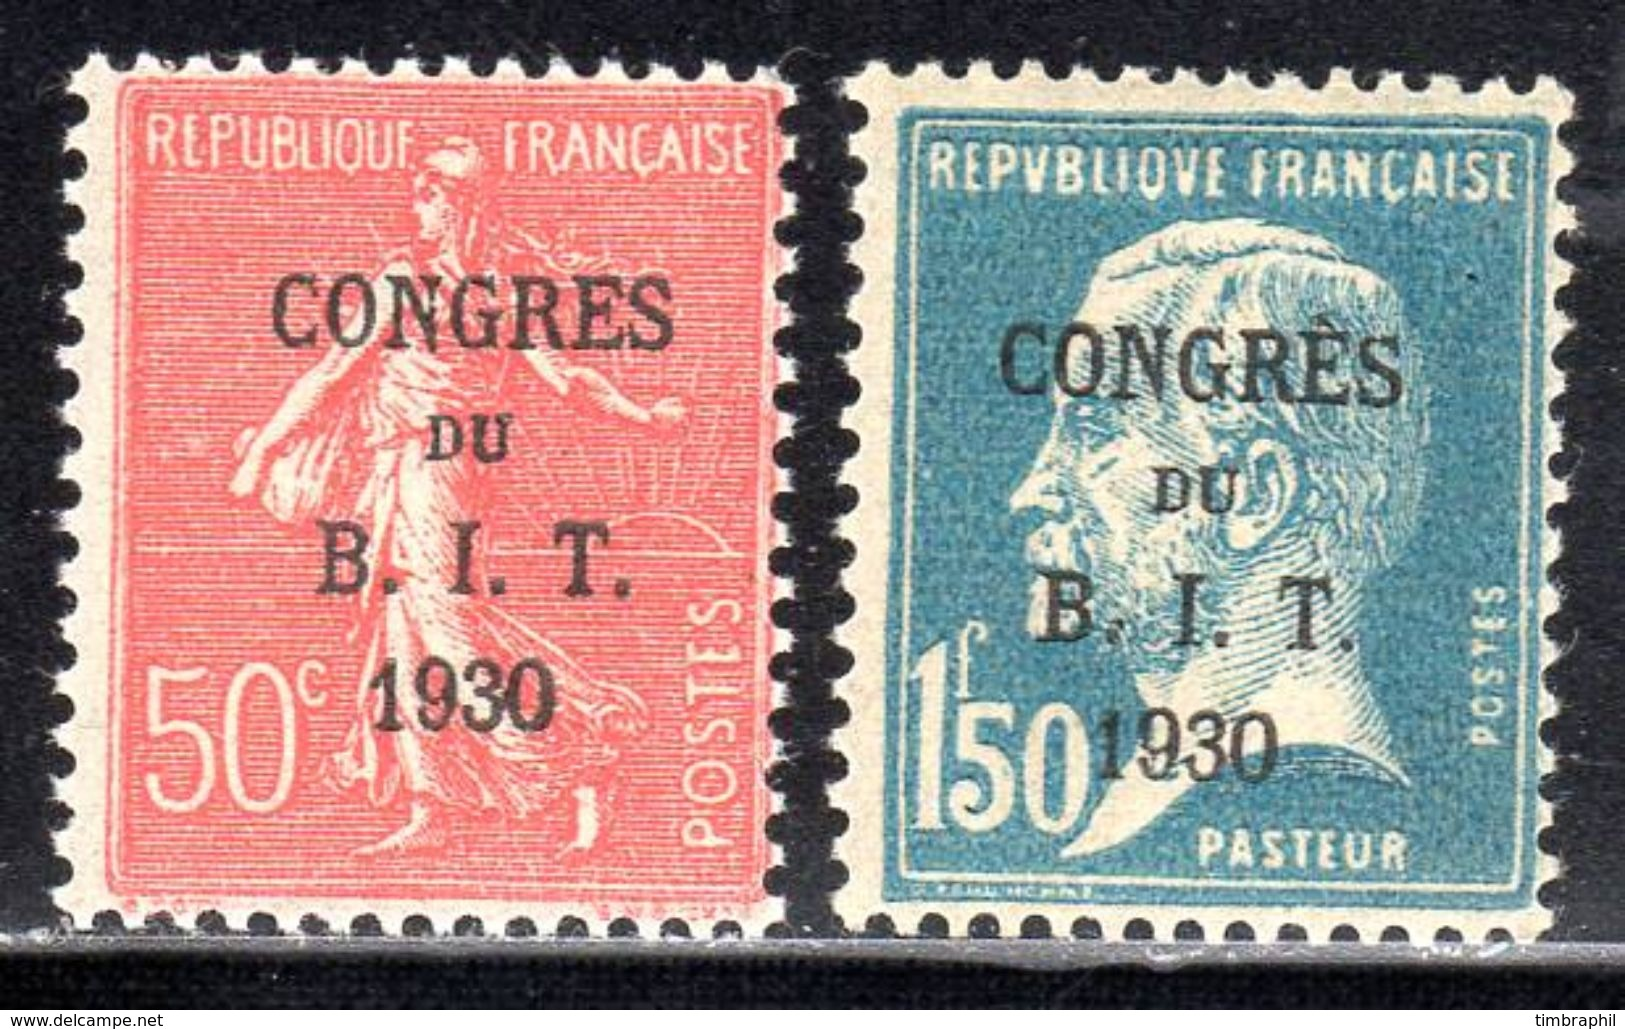 N° 264 & 265 (Congrès BIT 1930) Neufs*: COTE= 24 Euros !!! - Unused Stamps